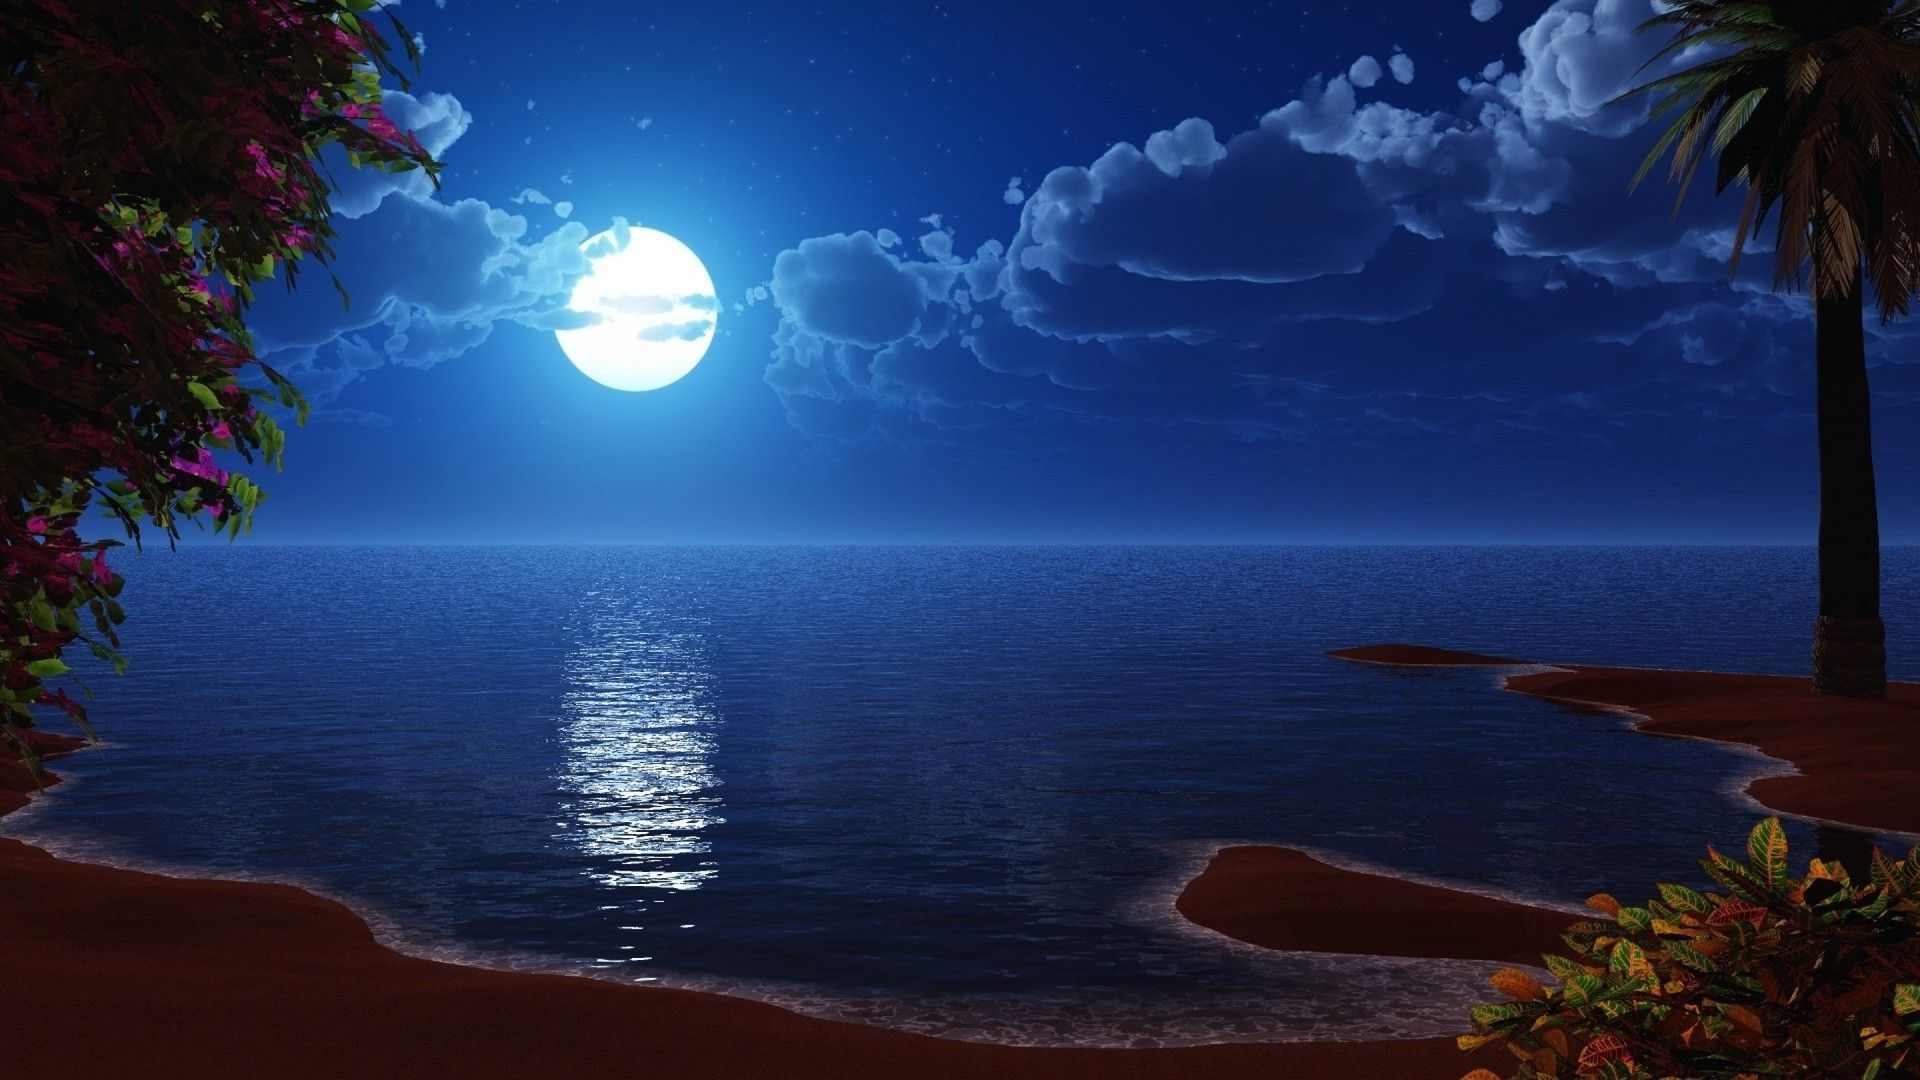 Wallpaper For Desktop Moon Night